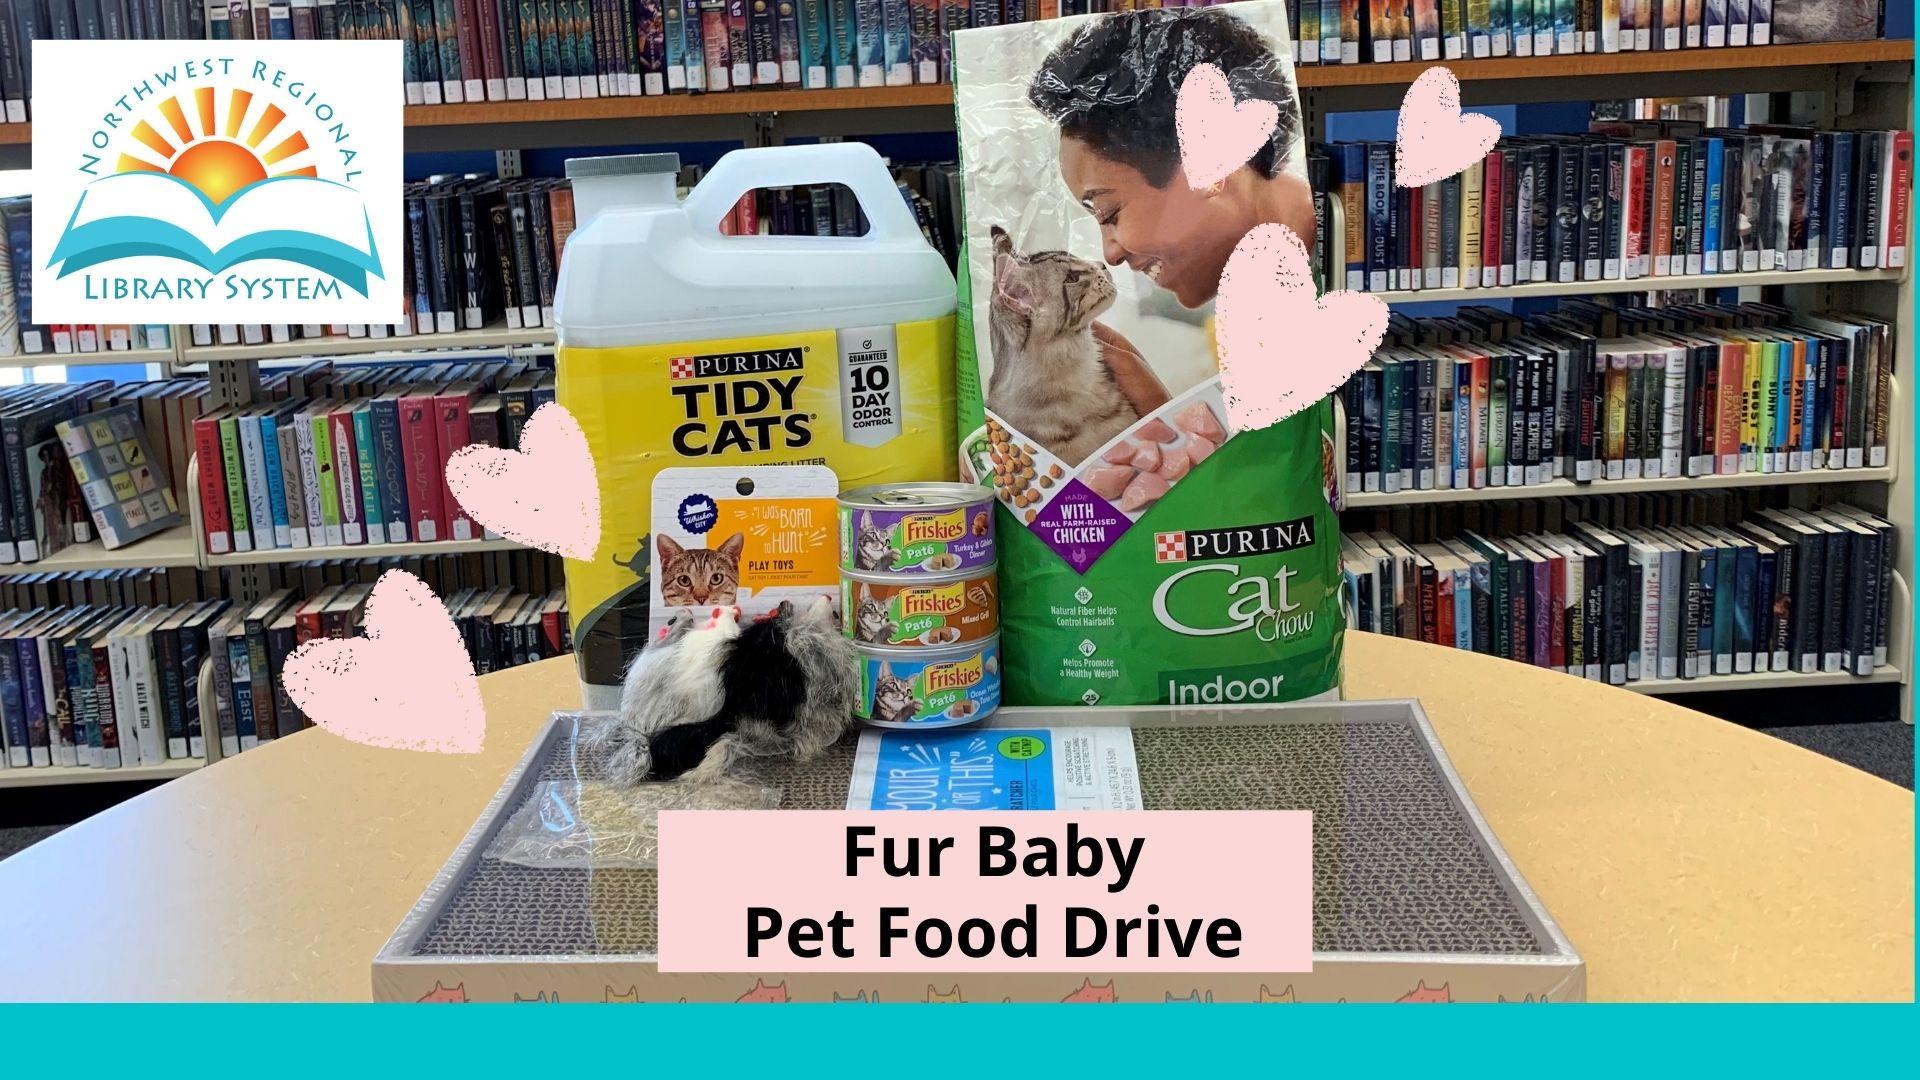 Fur Baby Pet Food Drive Gulf County